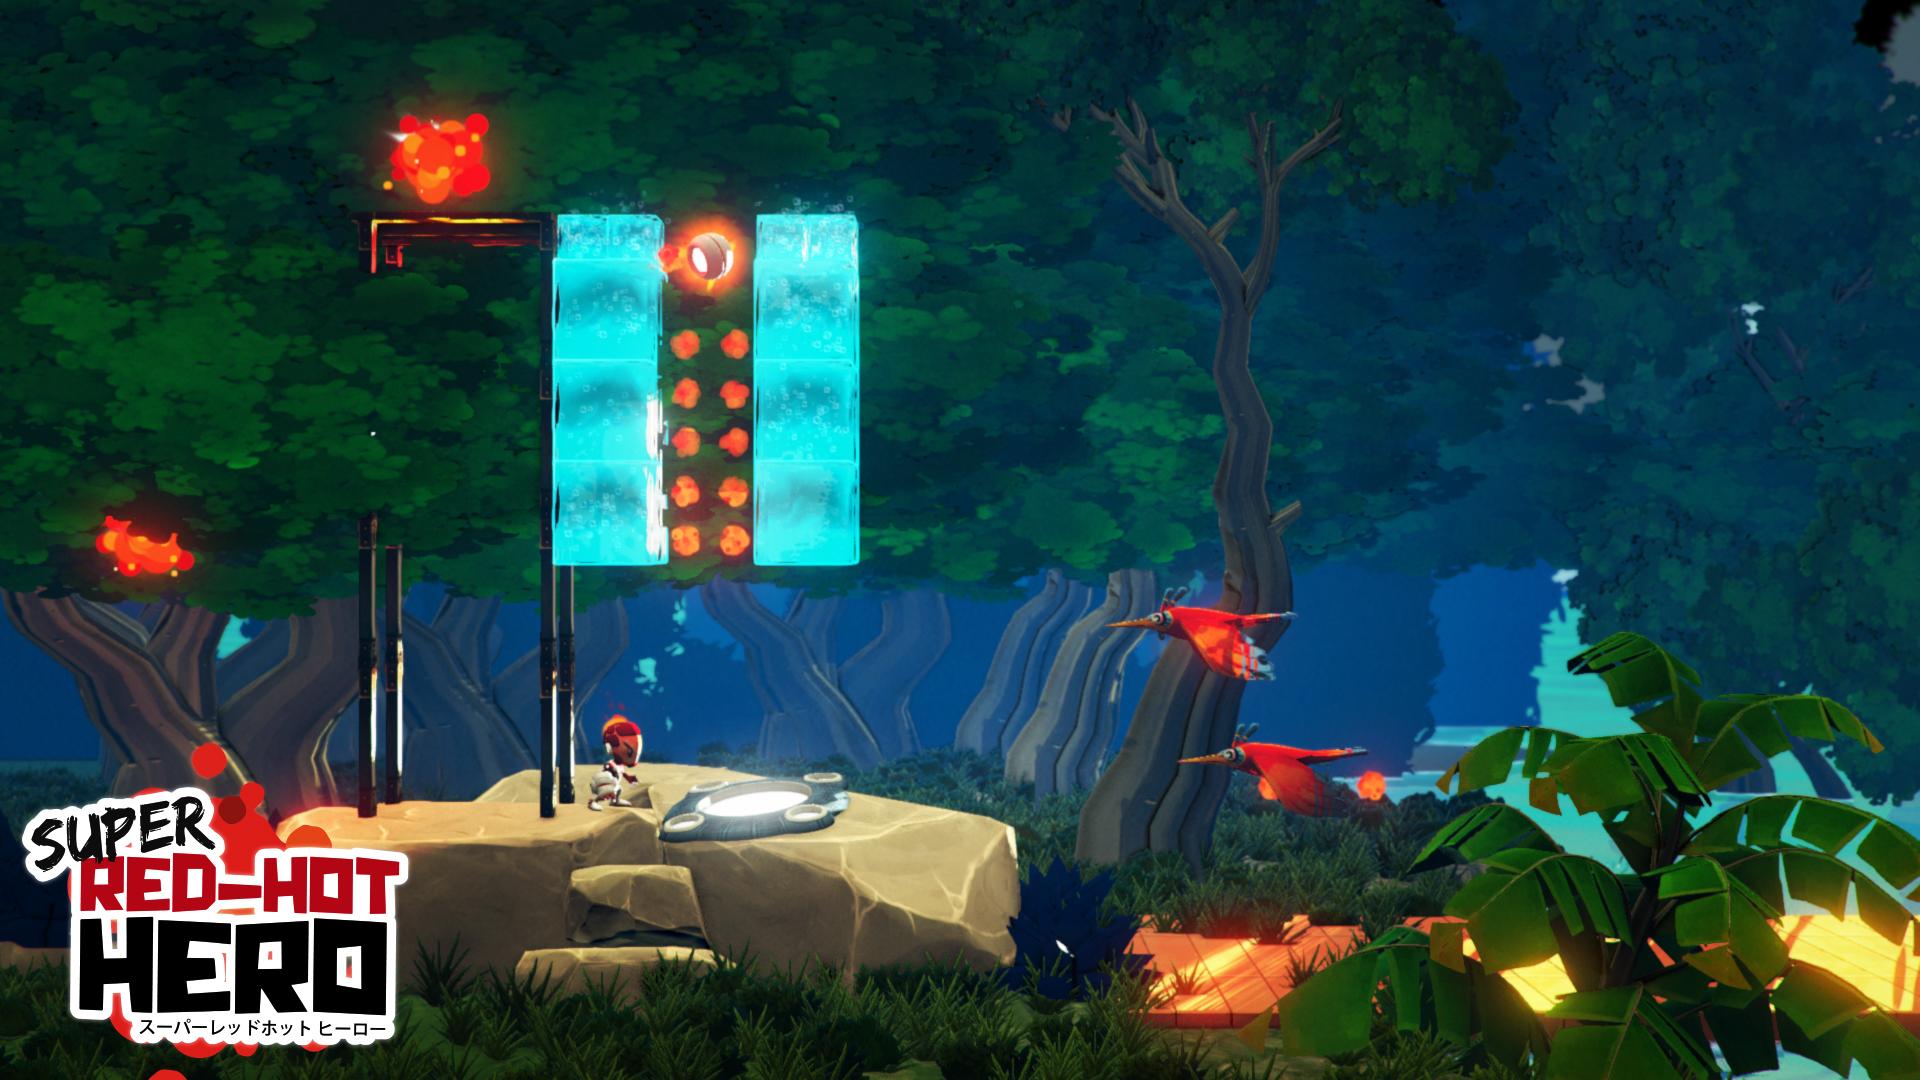 Super Red-Hot Hero screenshot